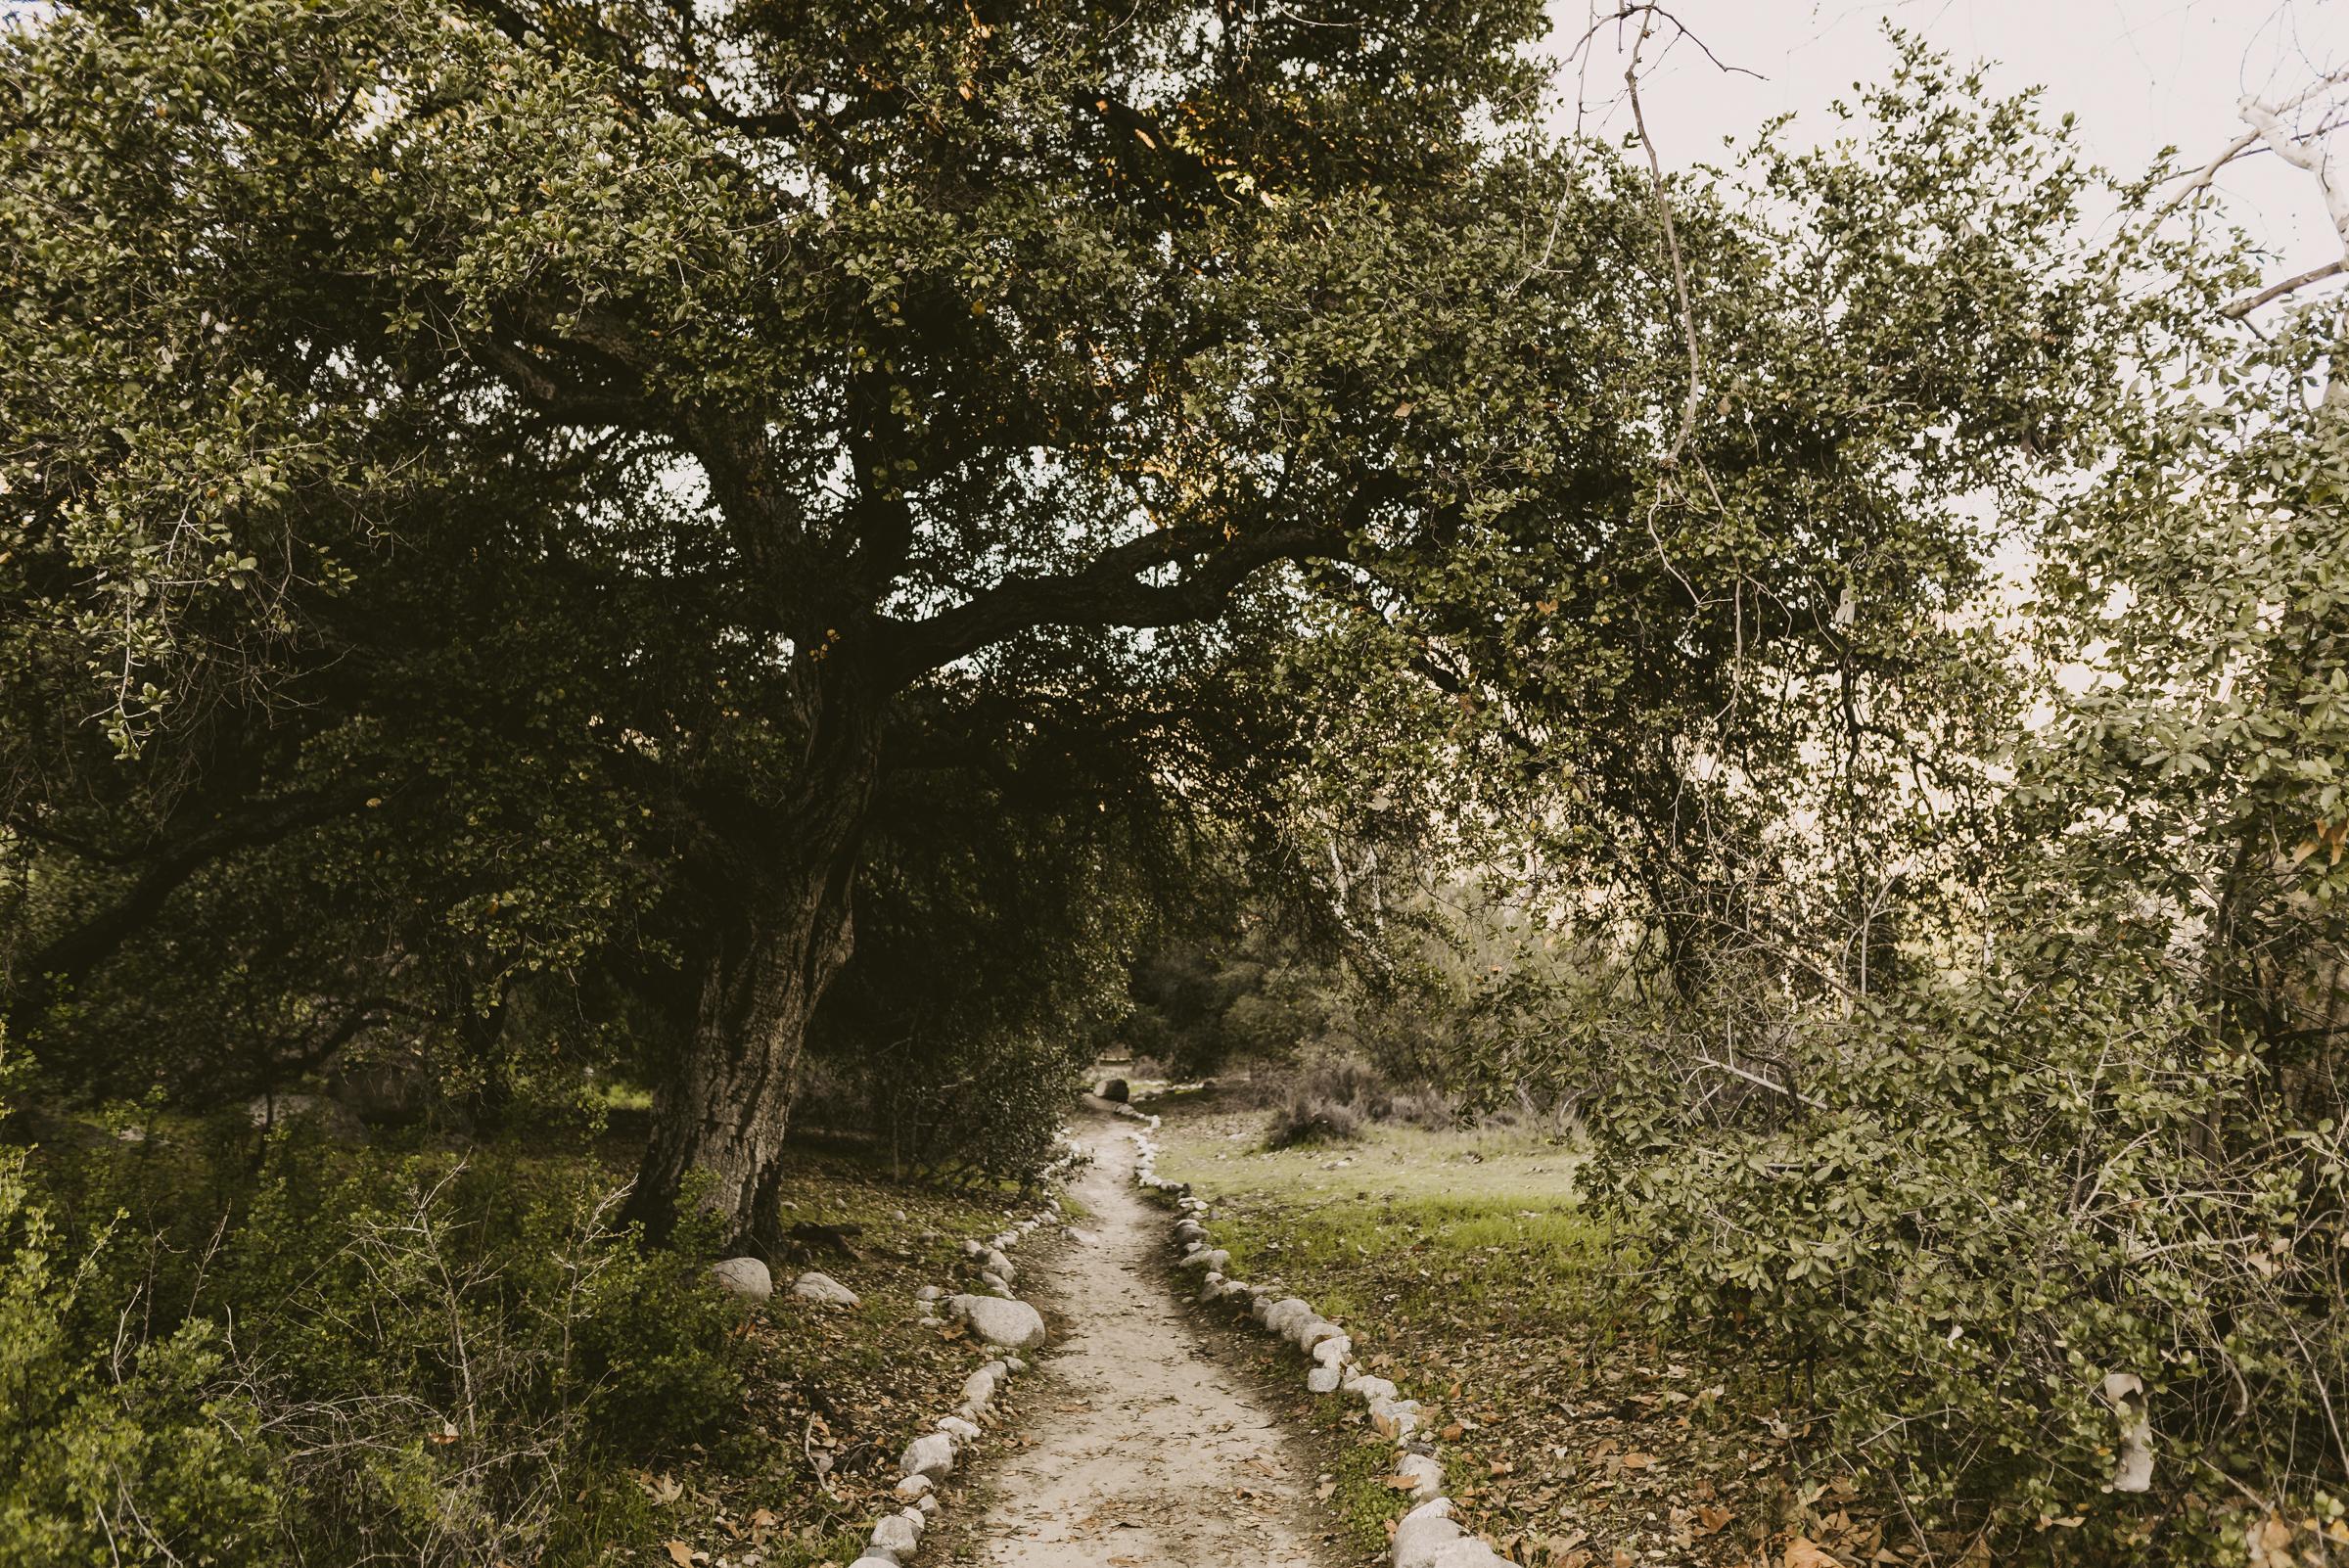 ©Isaiah + Taylor Photography - Intimate Elopement, Eaton Canyon, Los Angeles Wedding Photographer-1.jpg